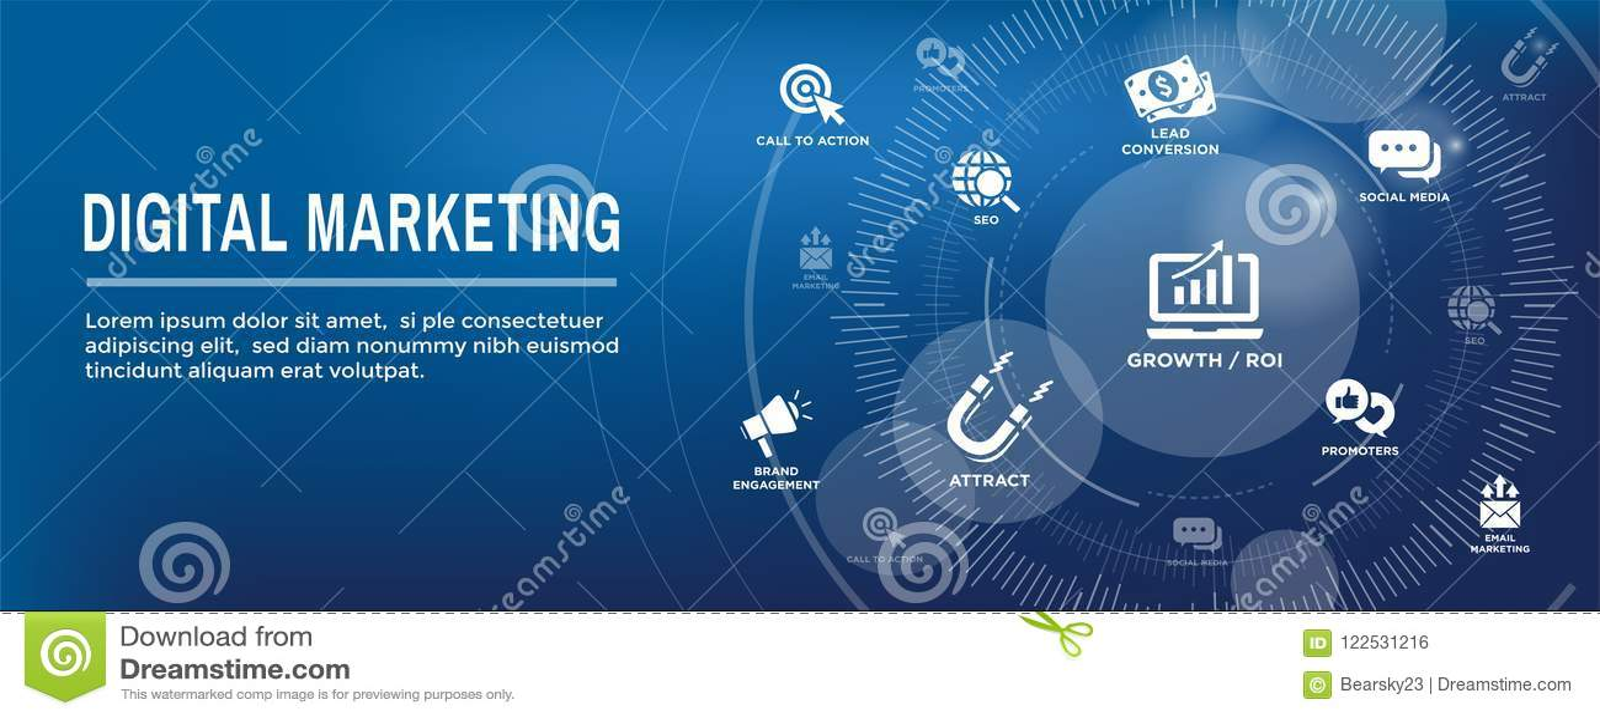 Digitale Binnenkomende Marketing Webbanner met Vectorpictogrammen w CTA, Gr.